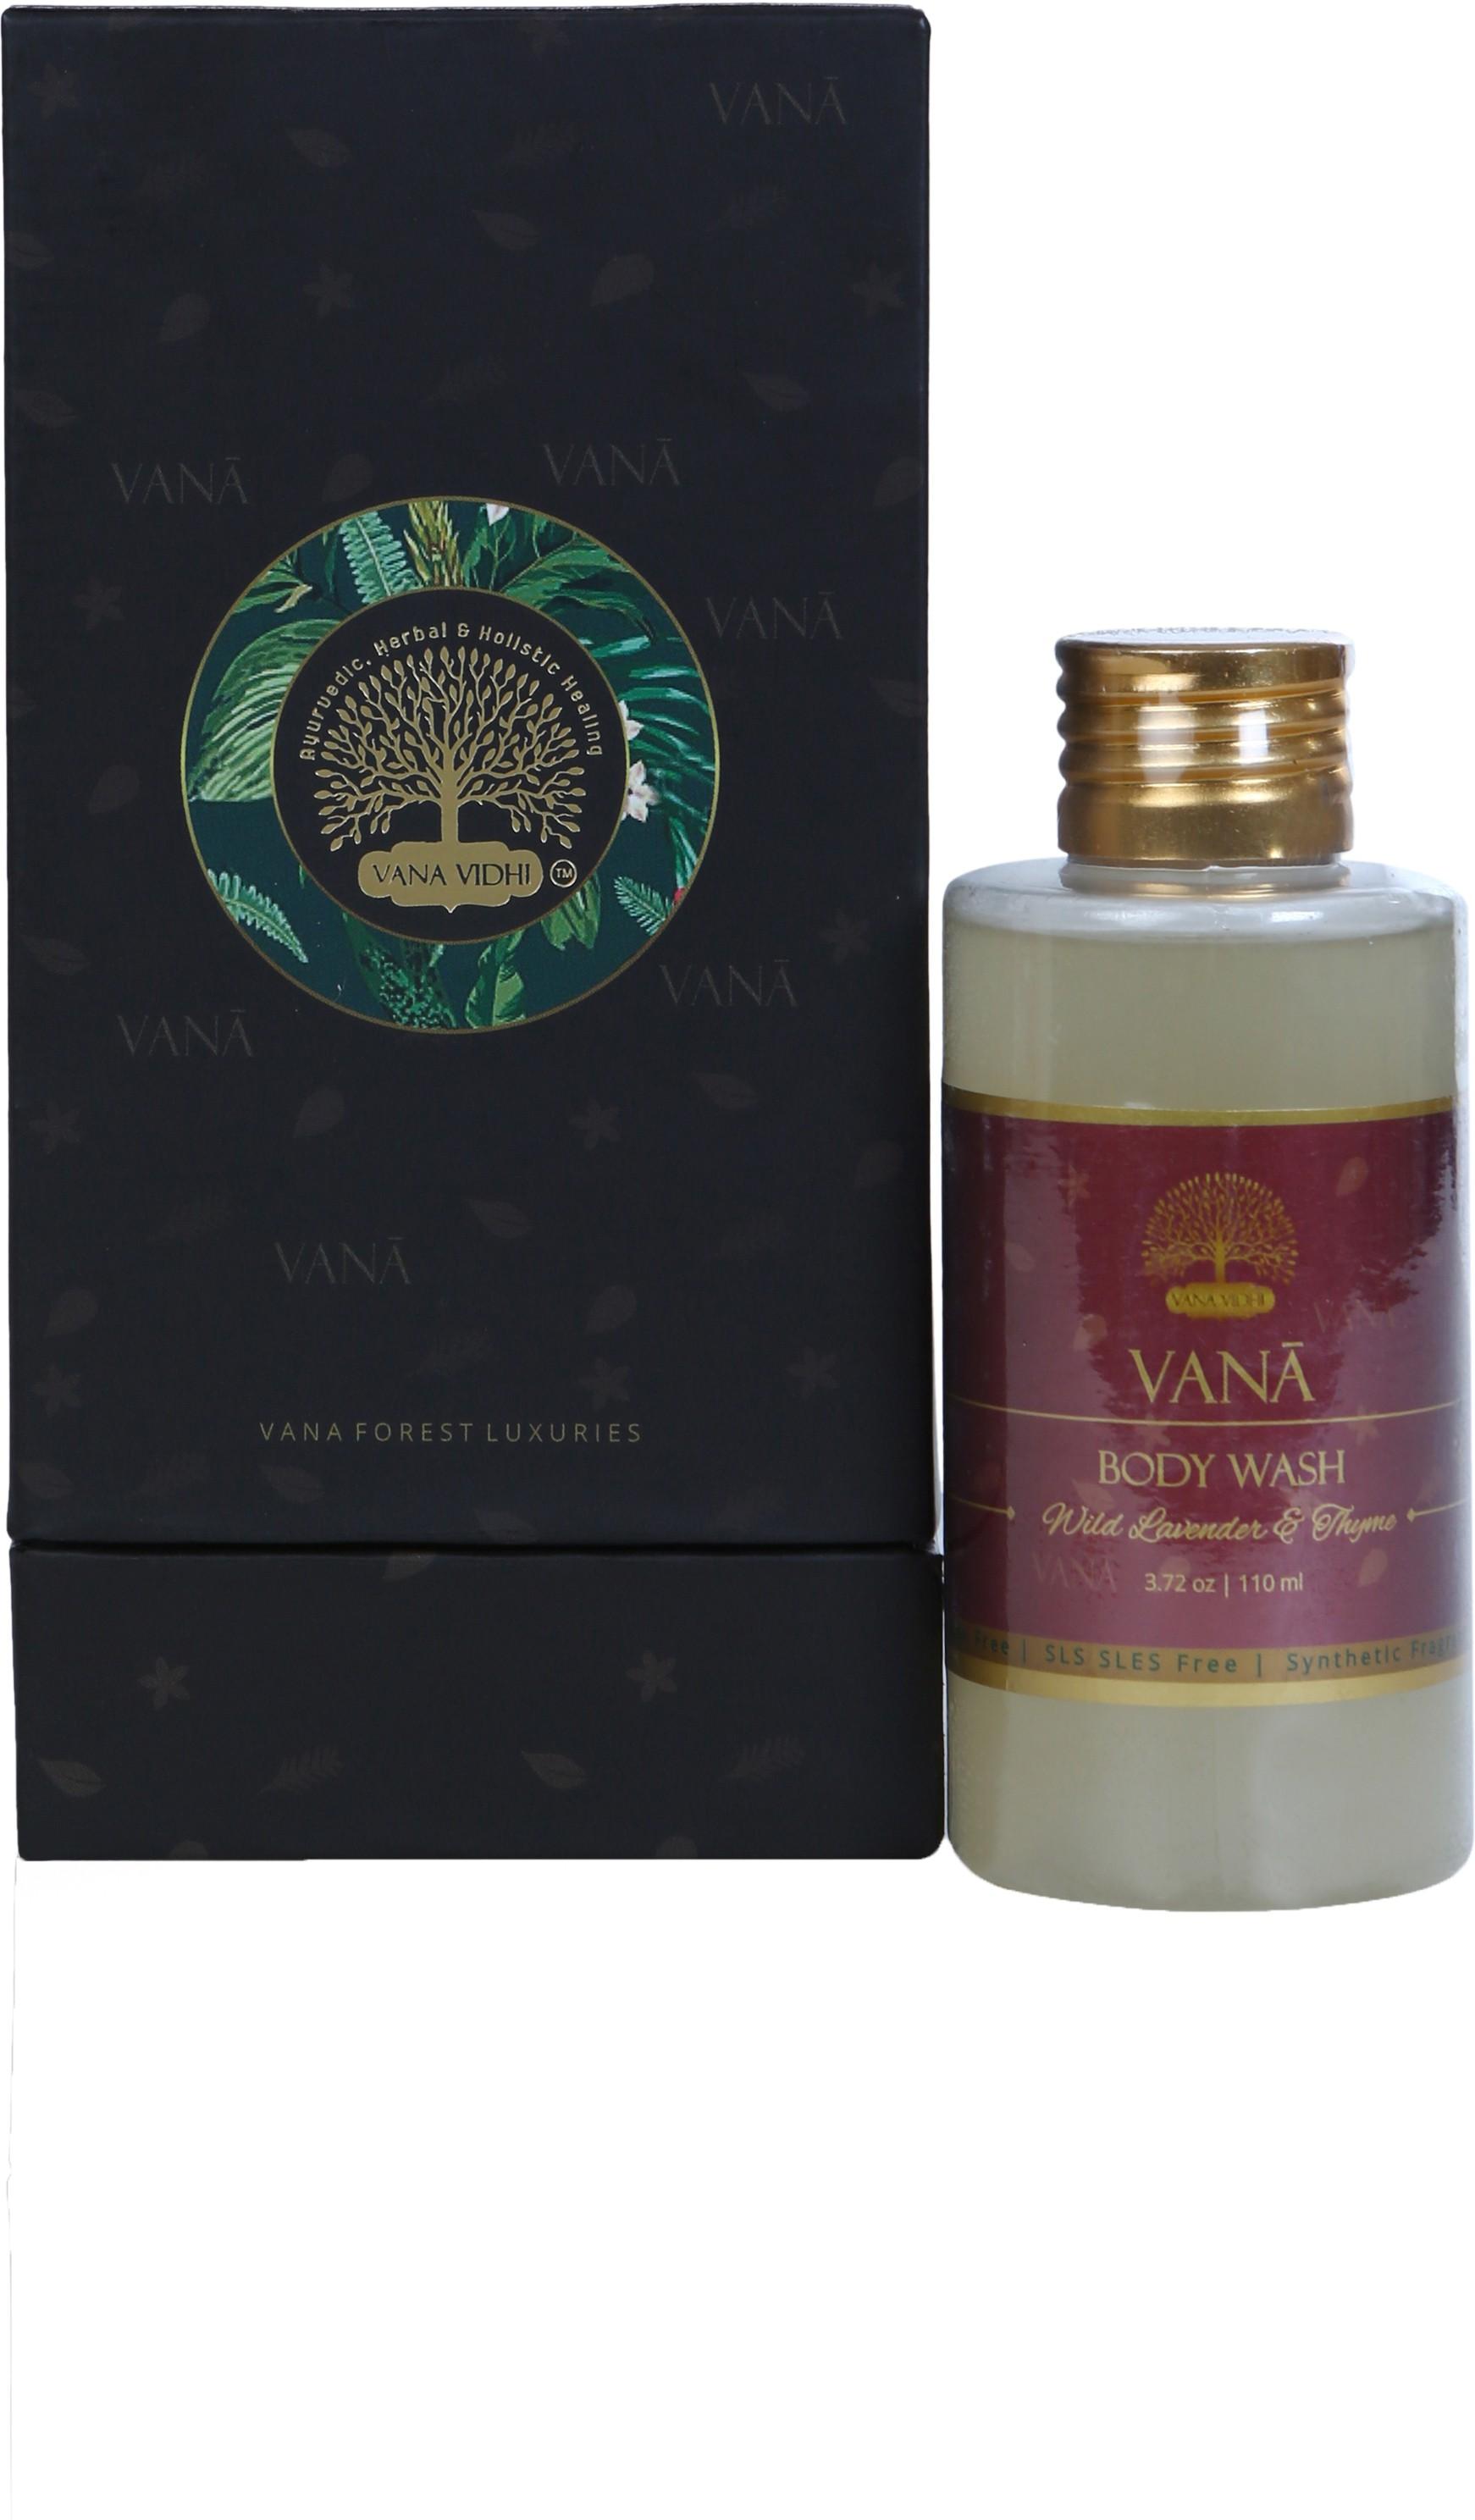 VANA VIDHI Wild Lavender & Thyme Body Wash(110 ml)